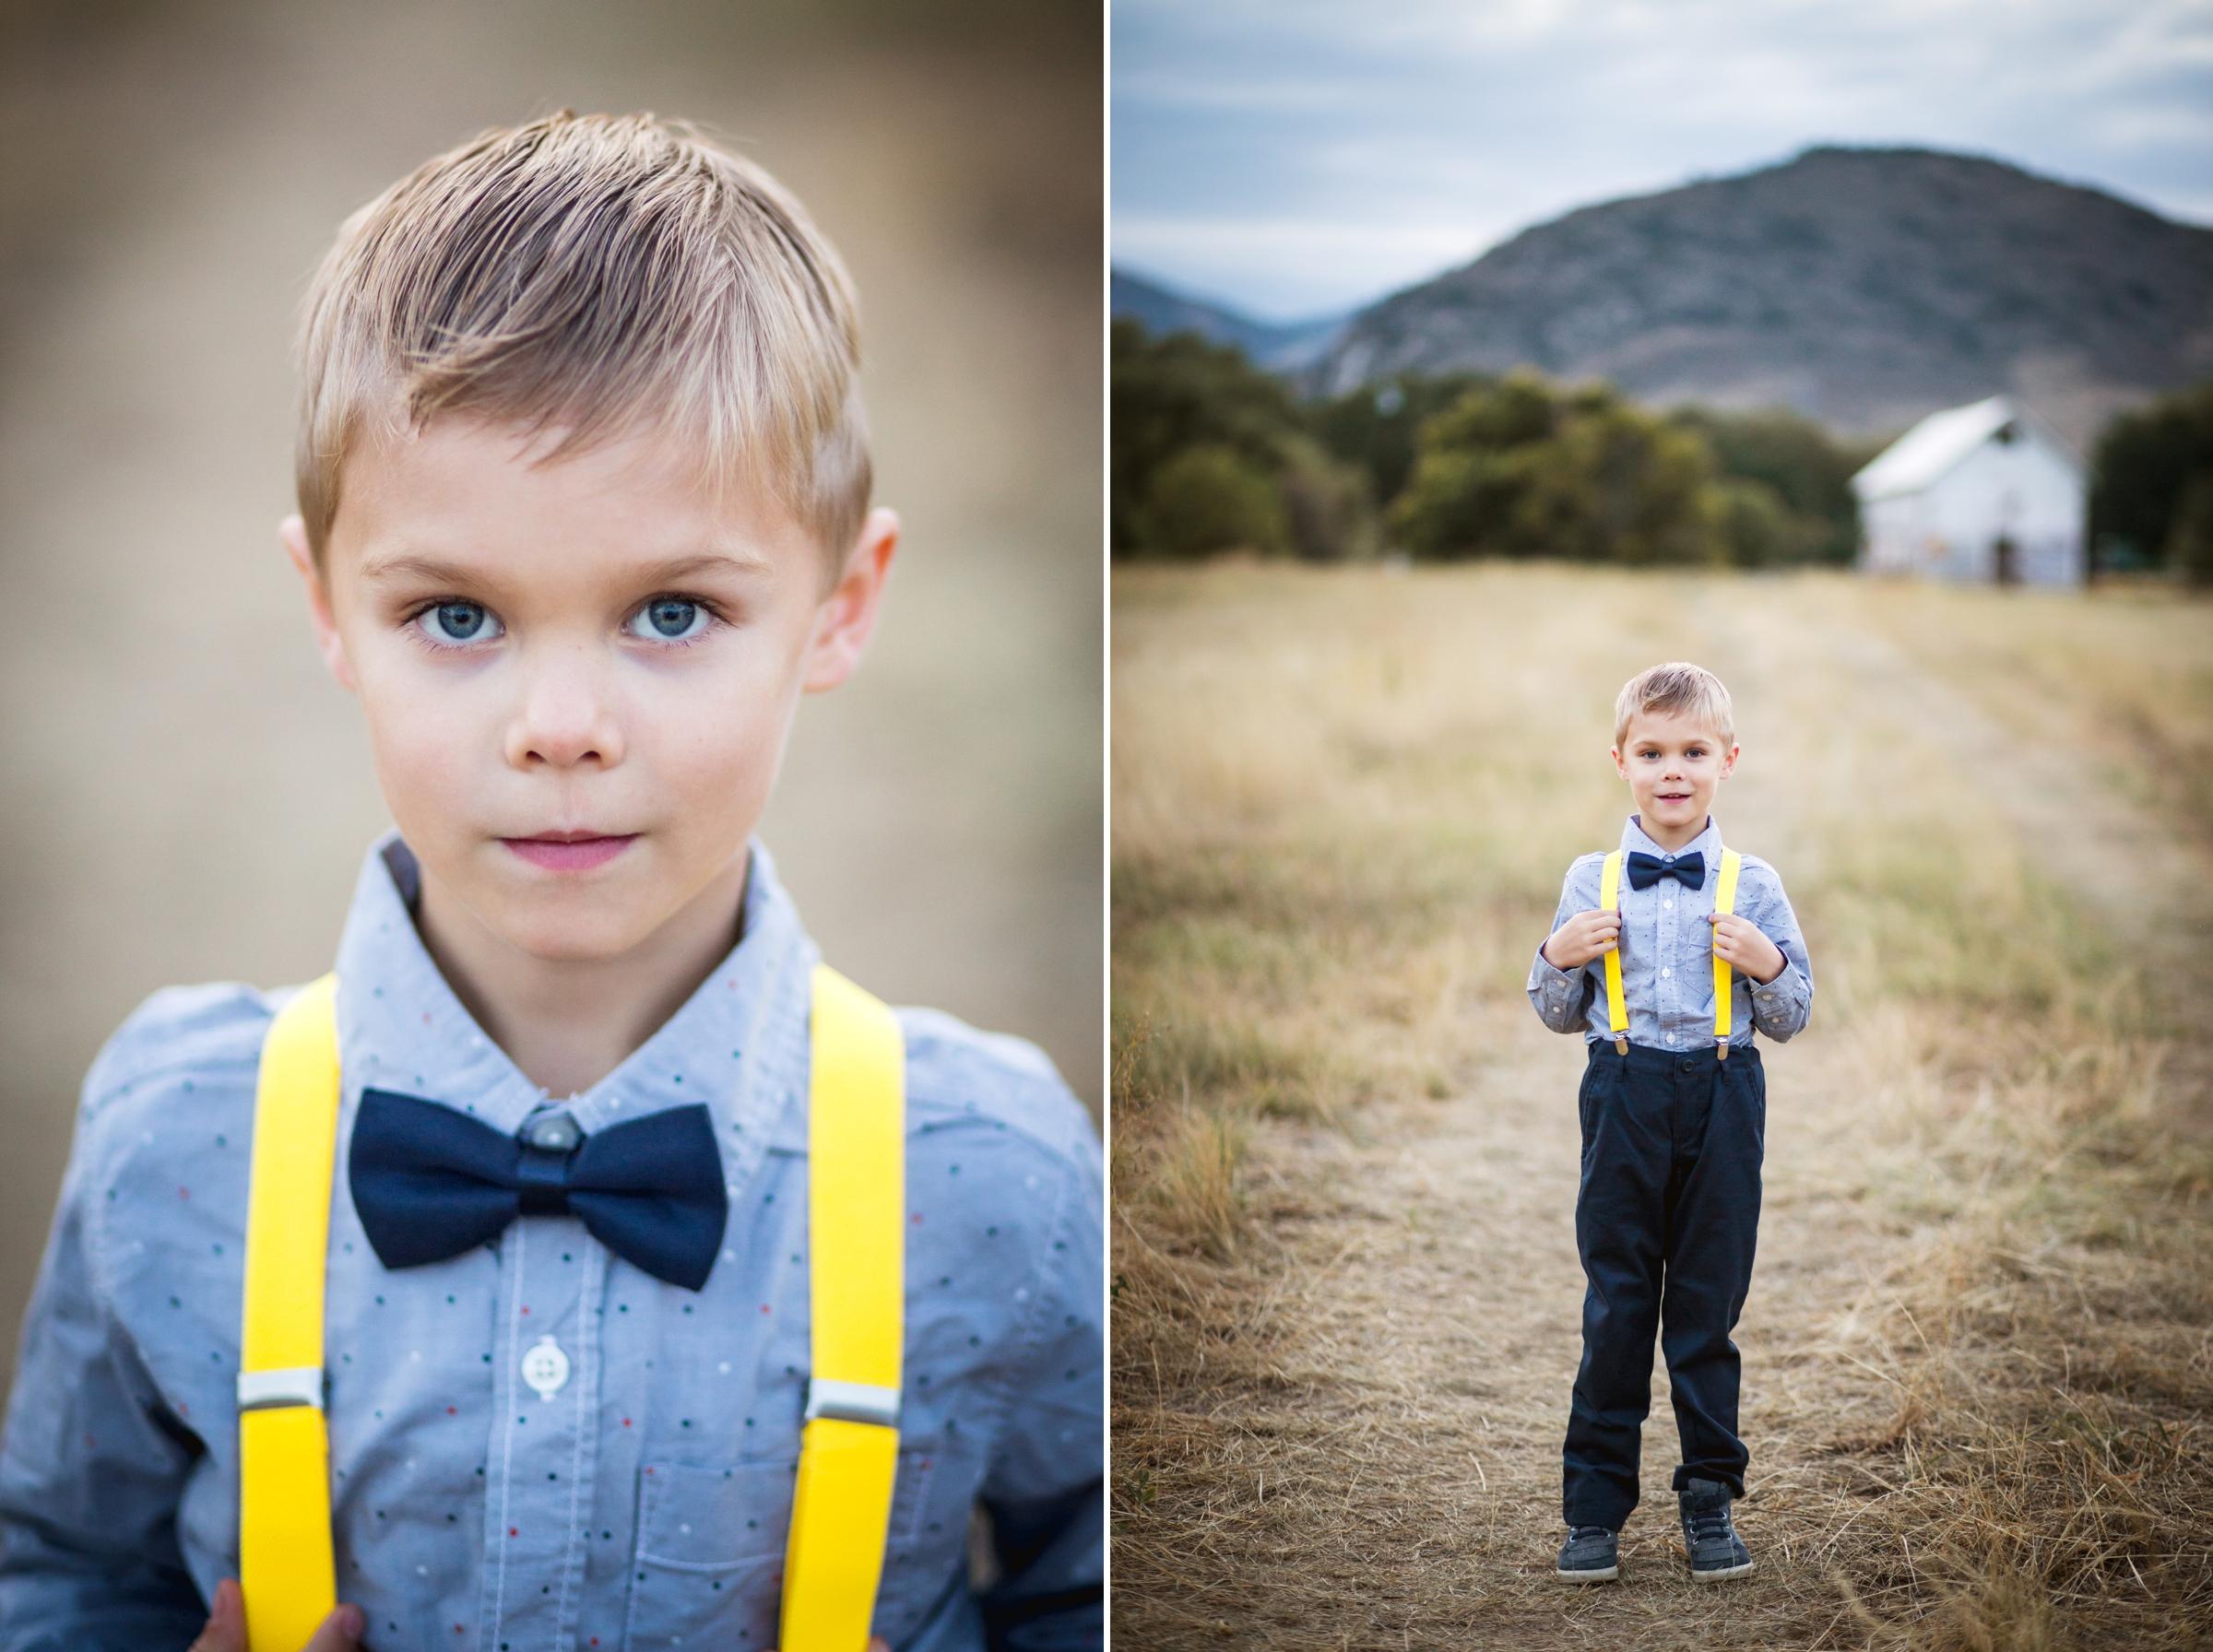 patient children photographer, autistic child photographer, children with disabilities photographer, children with special needs